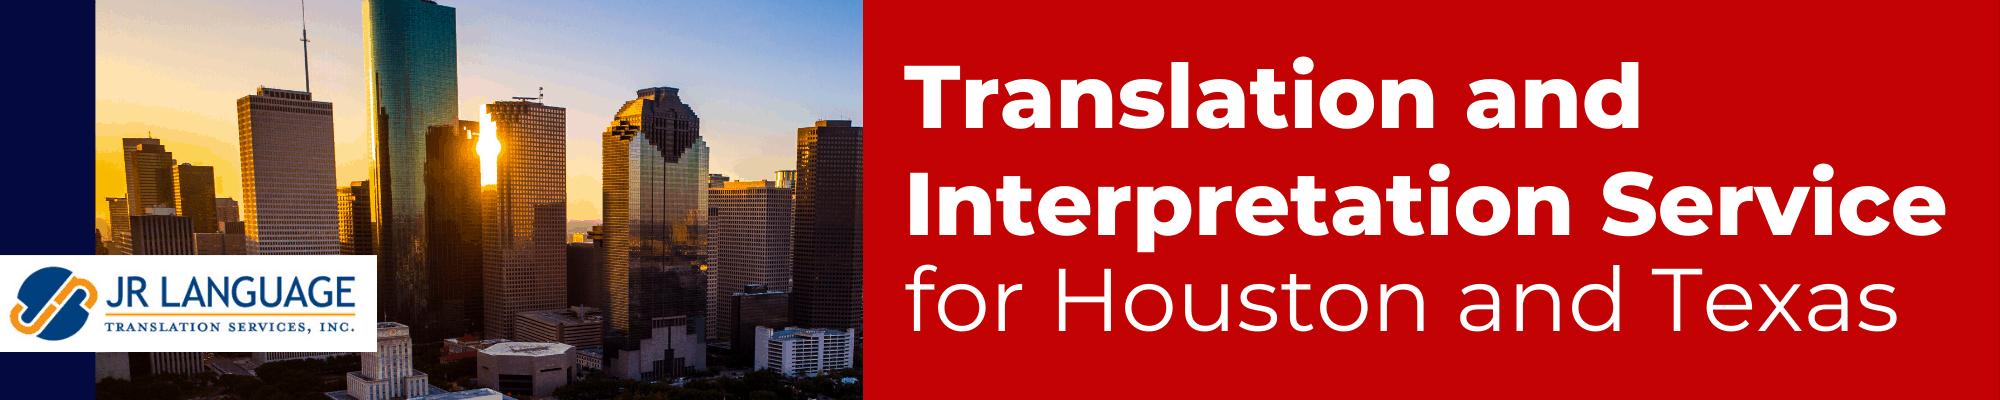 translation and interpretation services for Houston